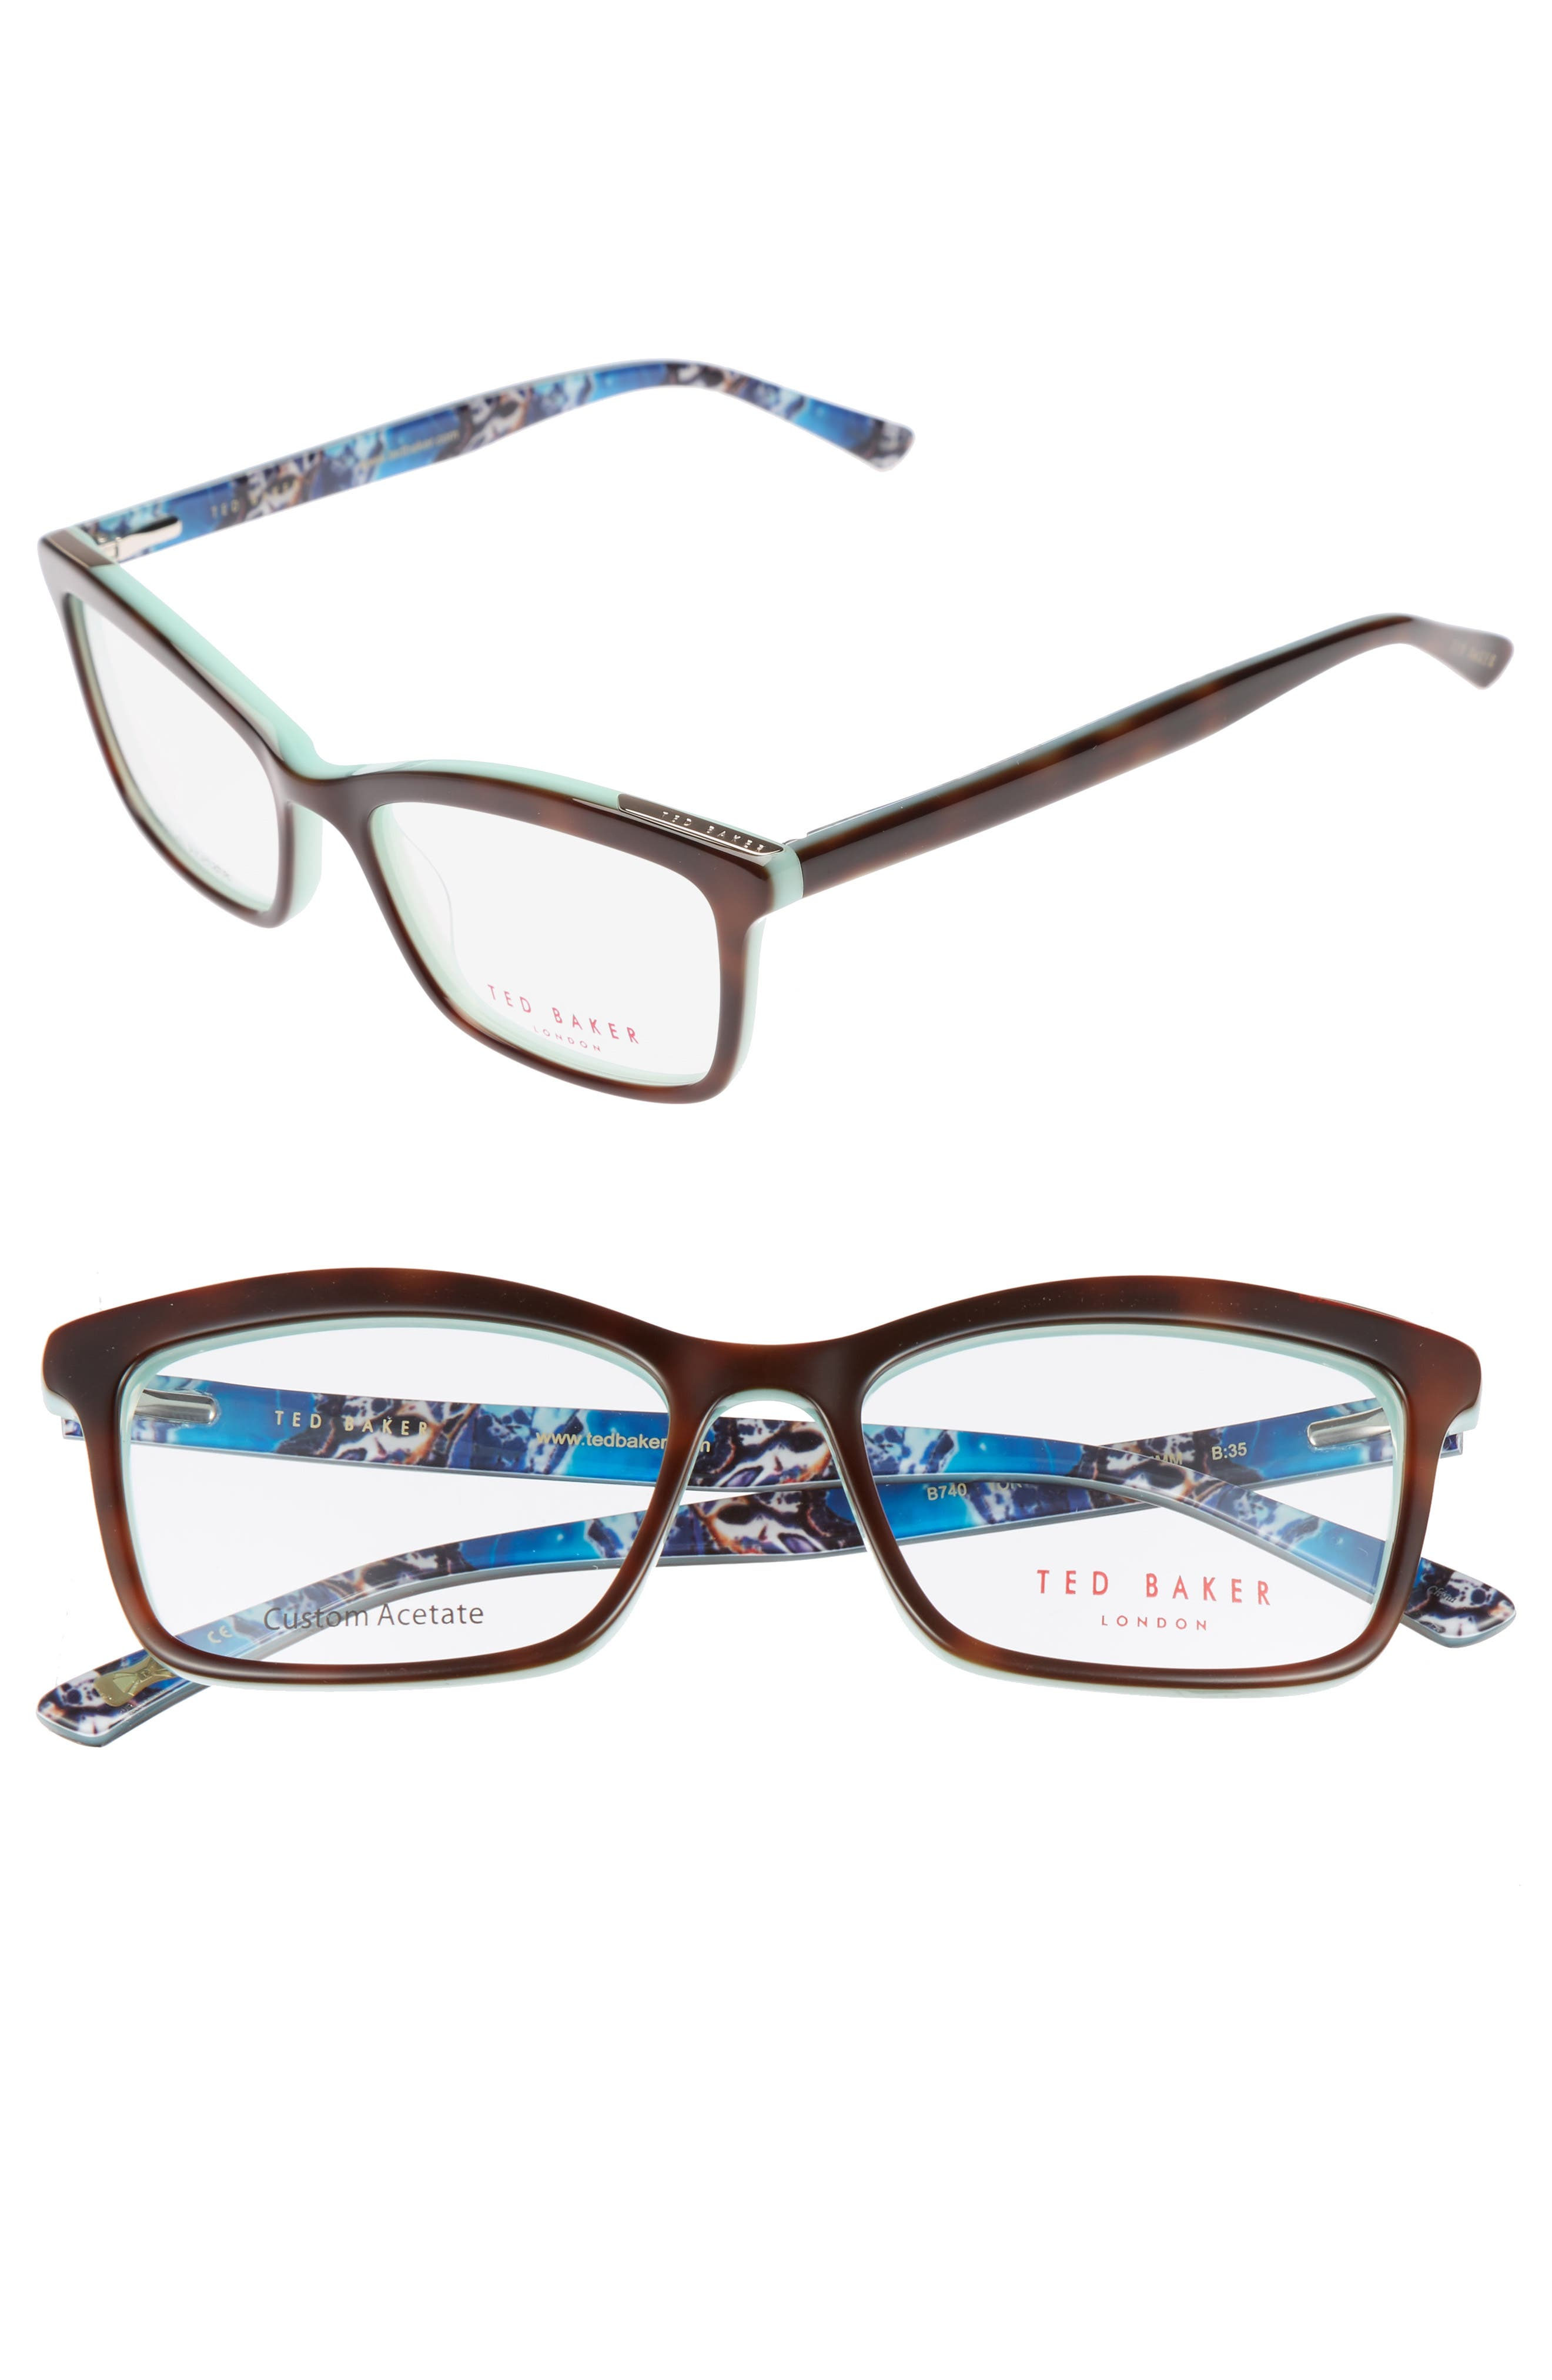 Alternate Image 1 Selected - Ted Baker London 52mm Optical Glasses